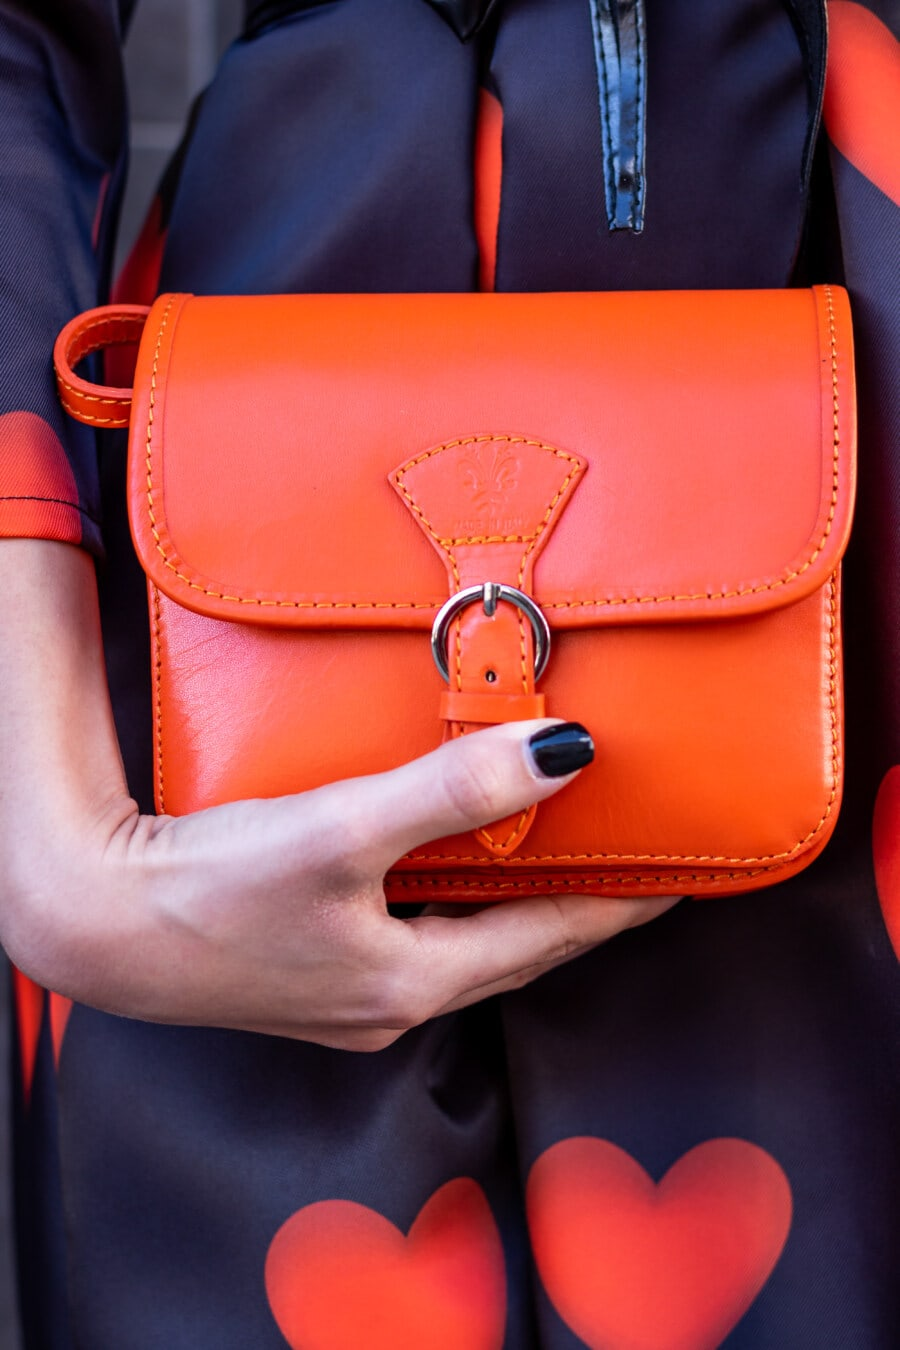 koža, narančasto žuta, torbu, modni, stil, odijelo, drži, ruka, žena, skladište